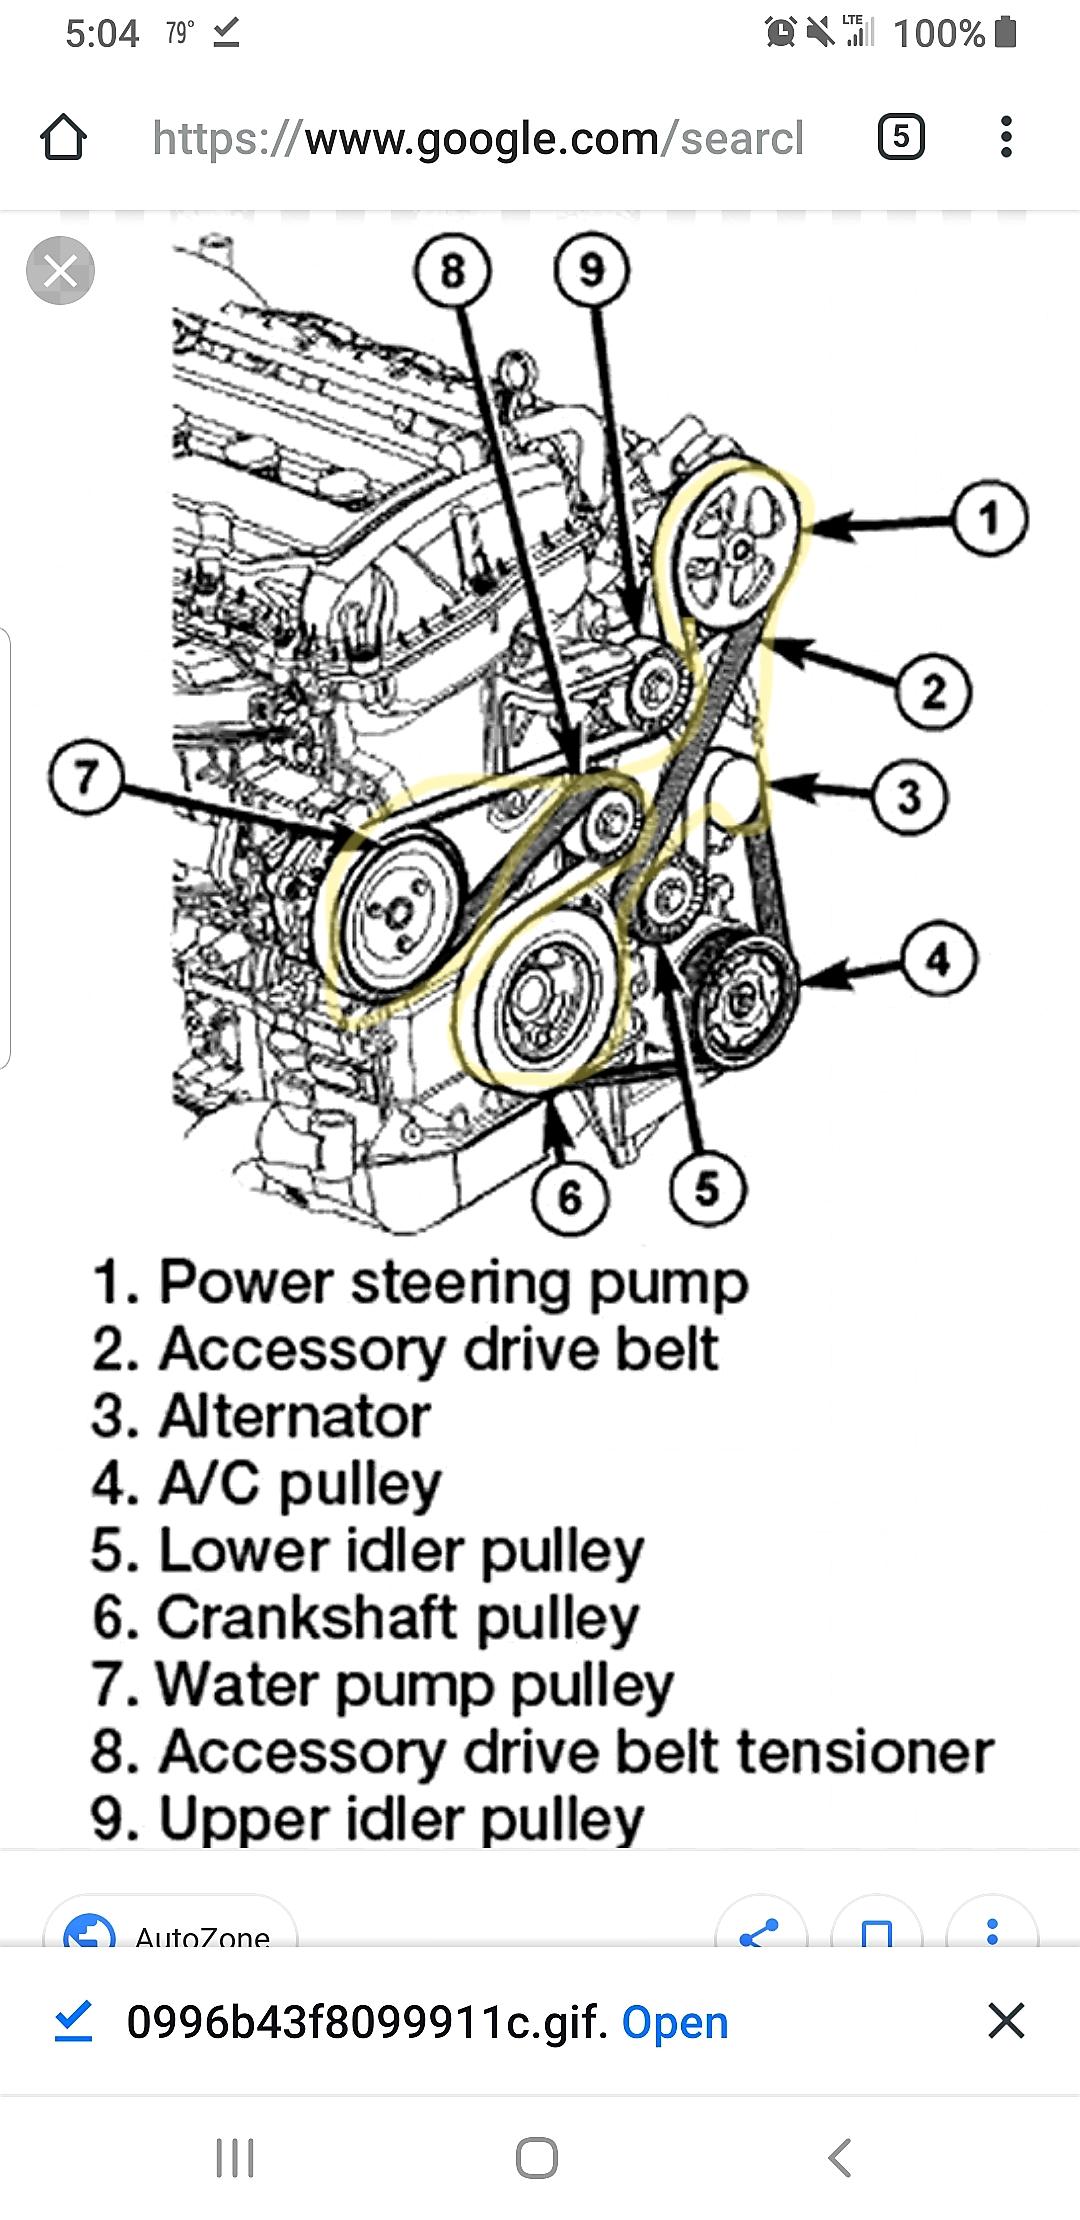 2010 Jeep Patriot Engine Diagram Wiring Diagrams Winner Manage Winner Manage Alcuoredeldiabete It